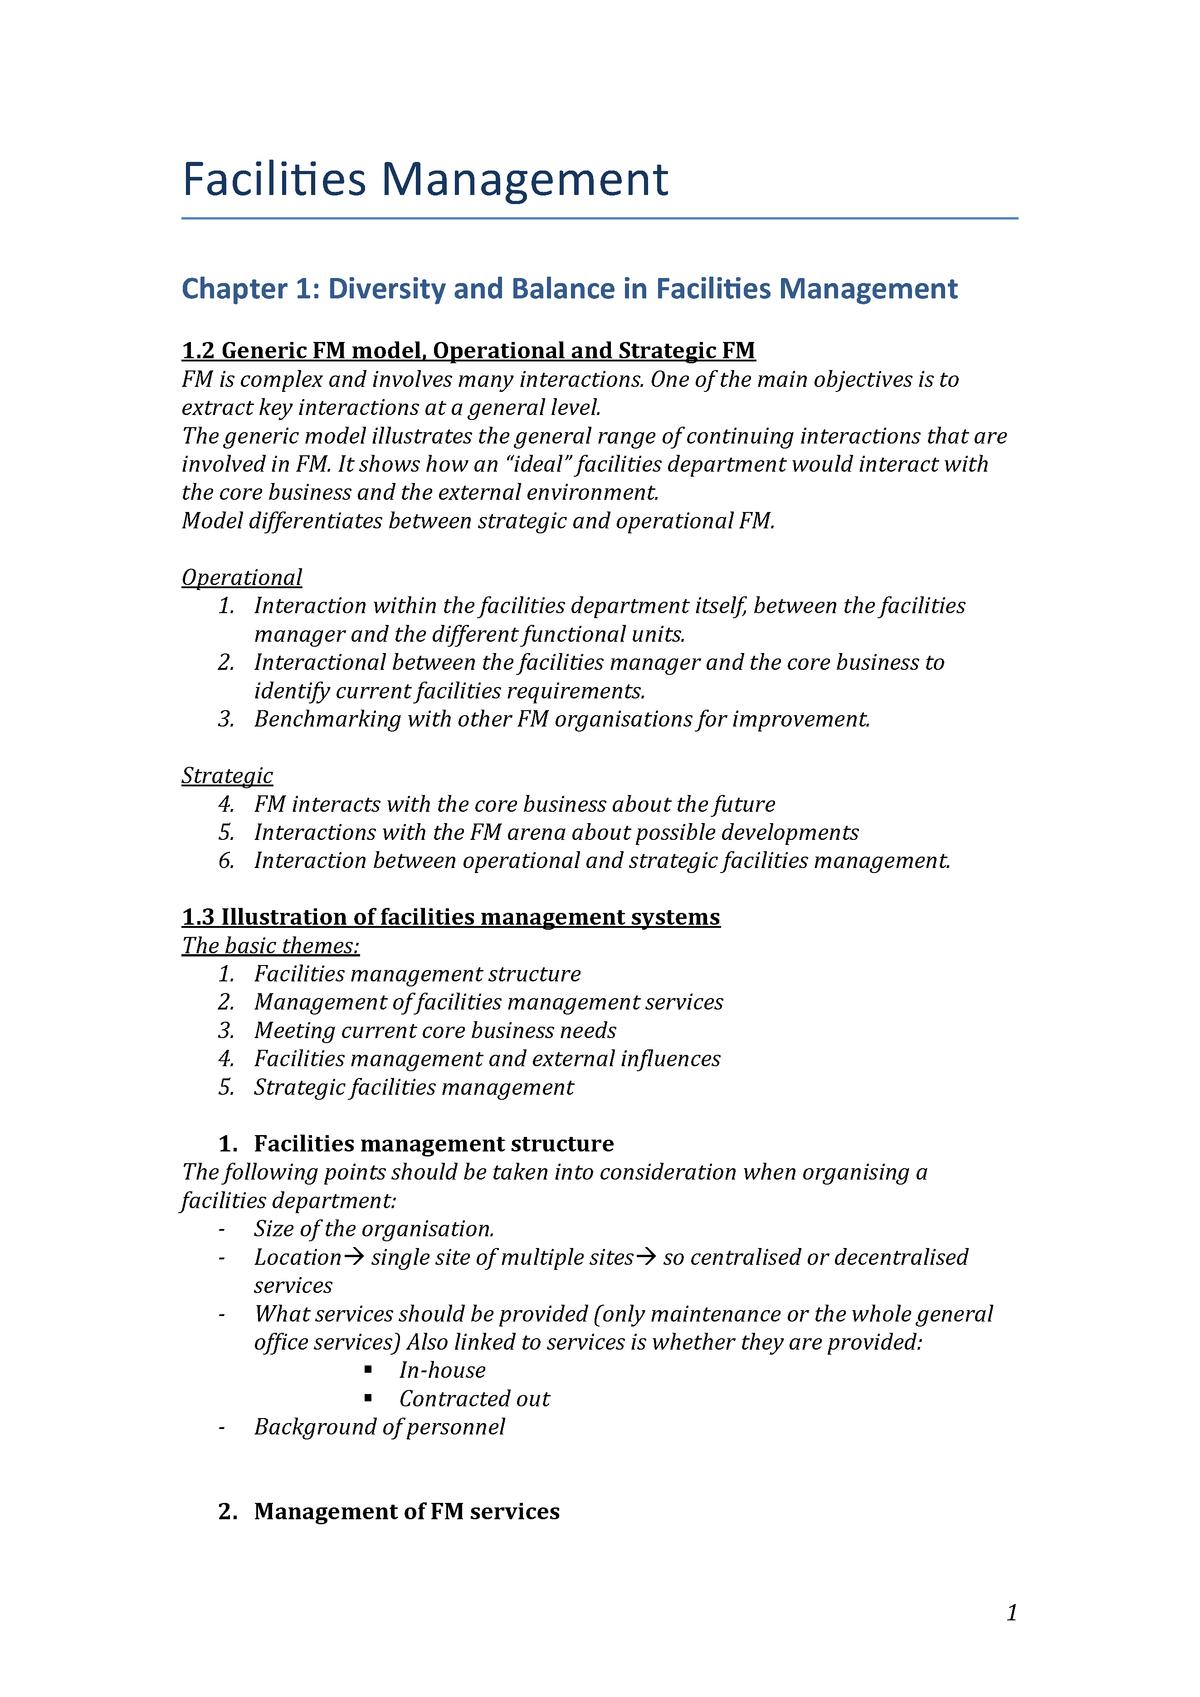 Facilities Management chp 1,3,4,9 - IFVP14WFM1ITF - StudeerSnel nl